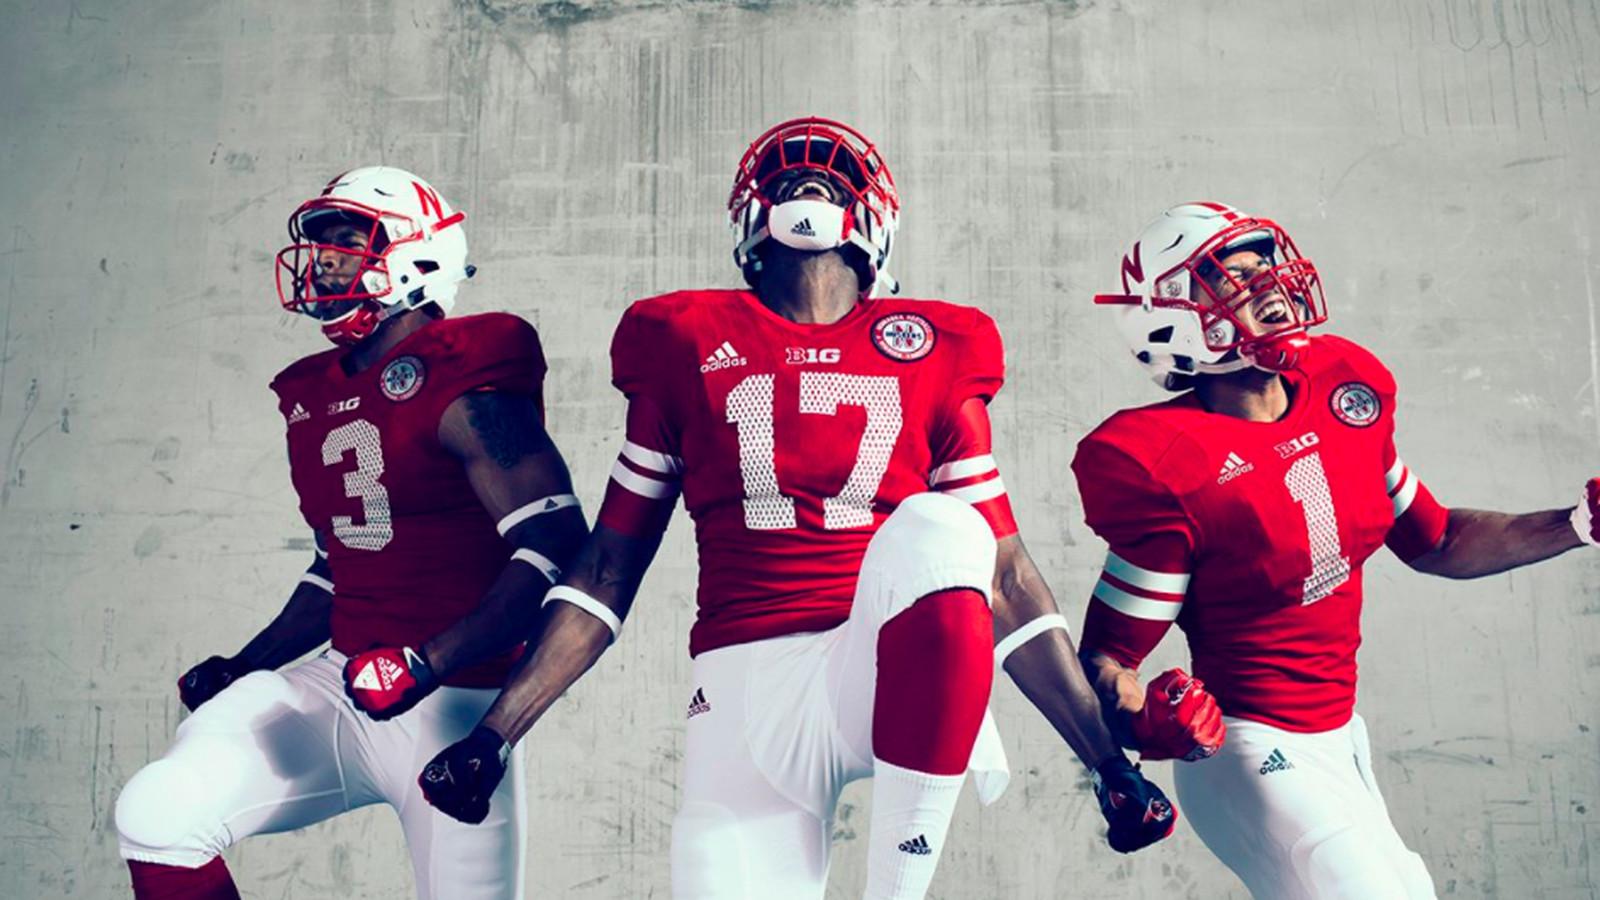 5c0b7327349 Adidas  college football uniforms are no longer universally terrible -  SBNation.com